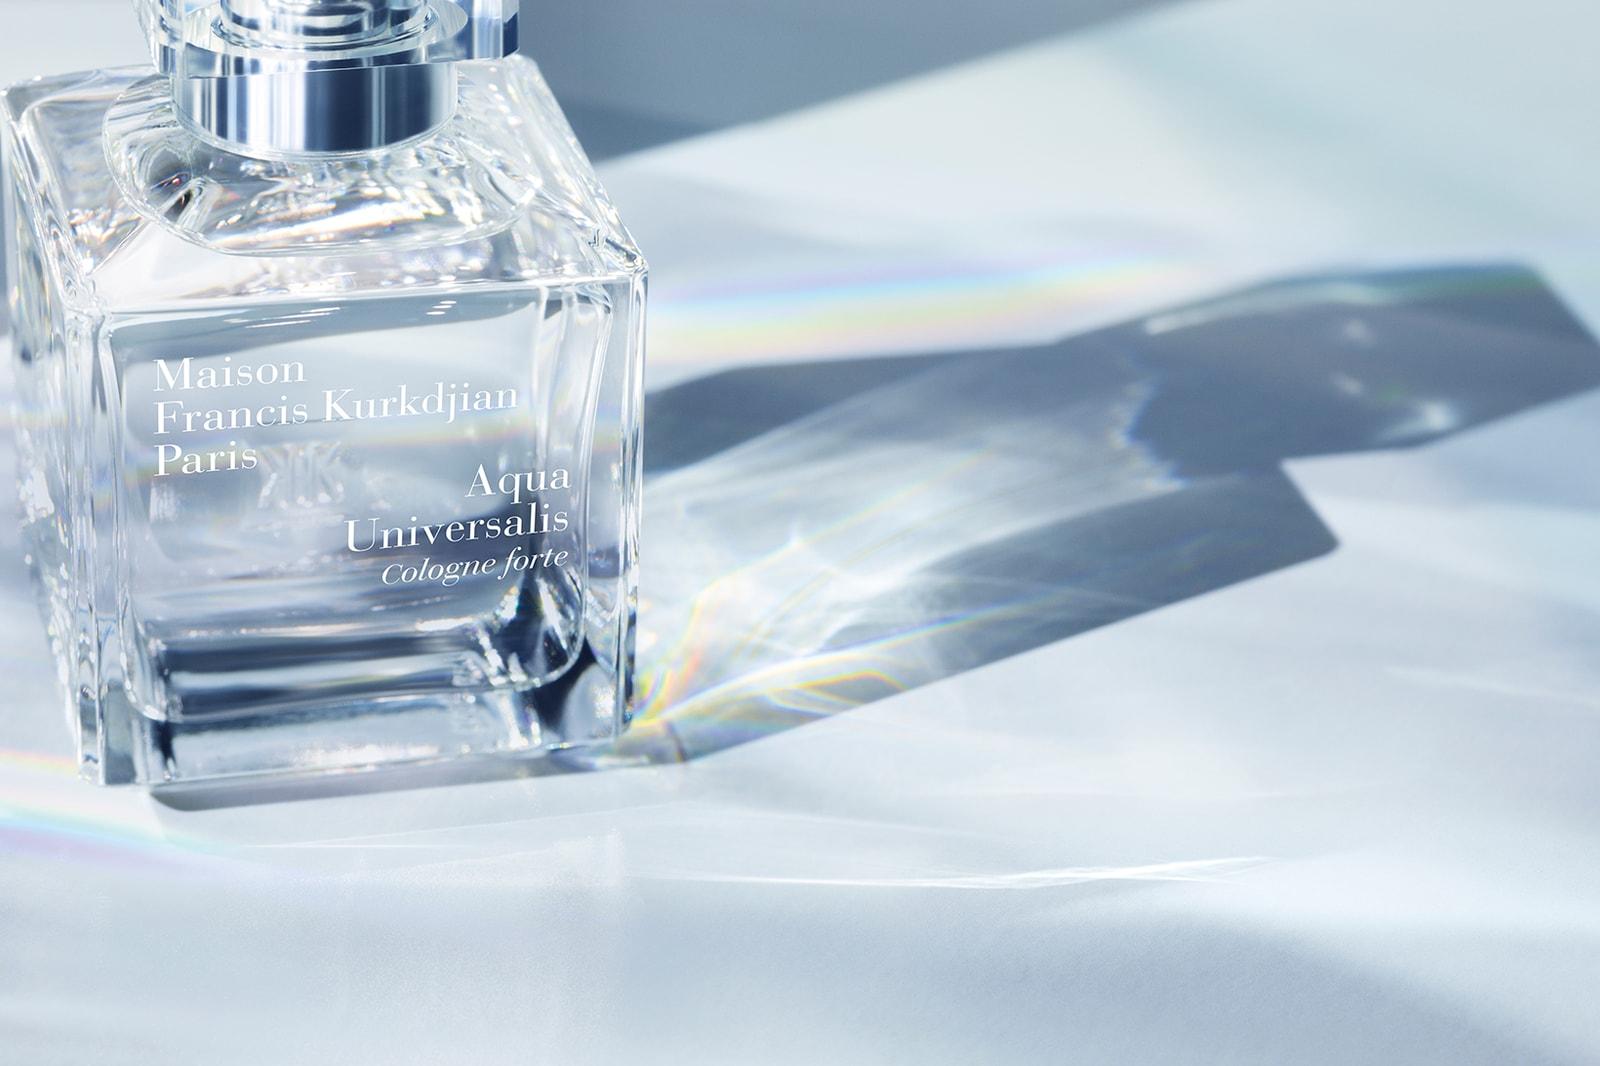 Maison Francis Kurkdjian Perfumer Parfum Christian Dior Creation Director Fragrances